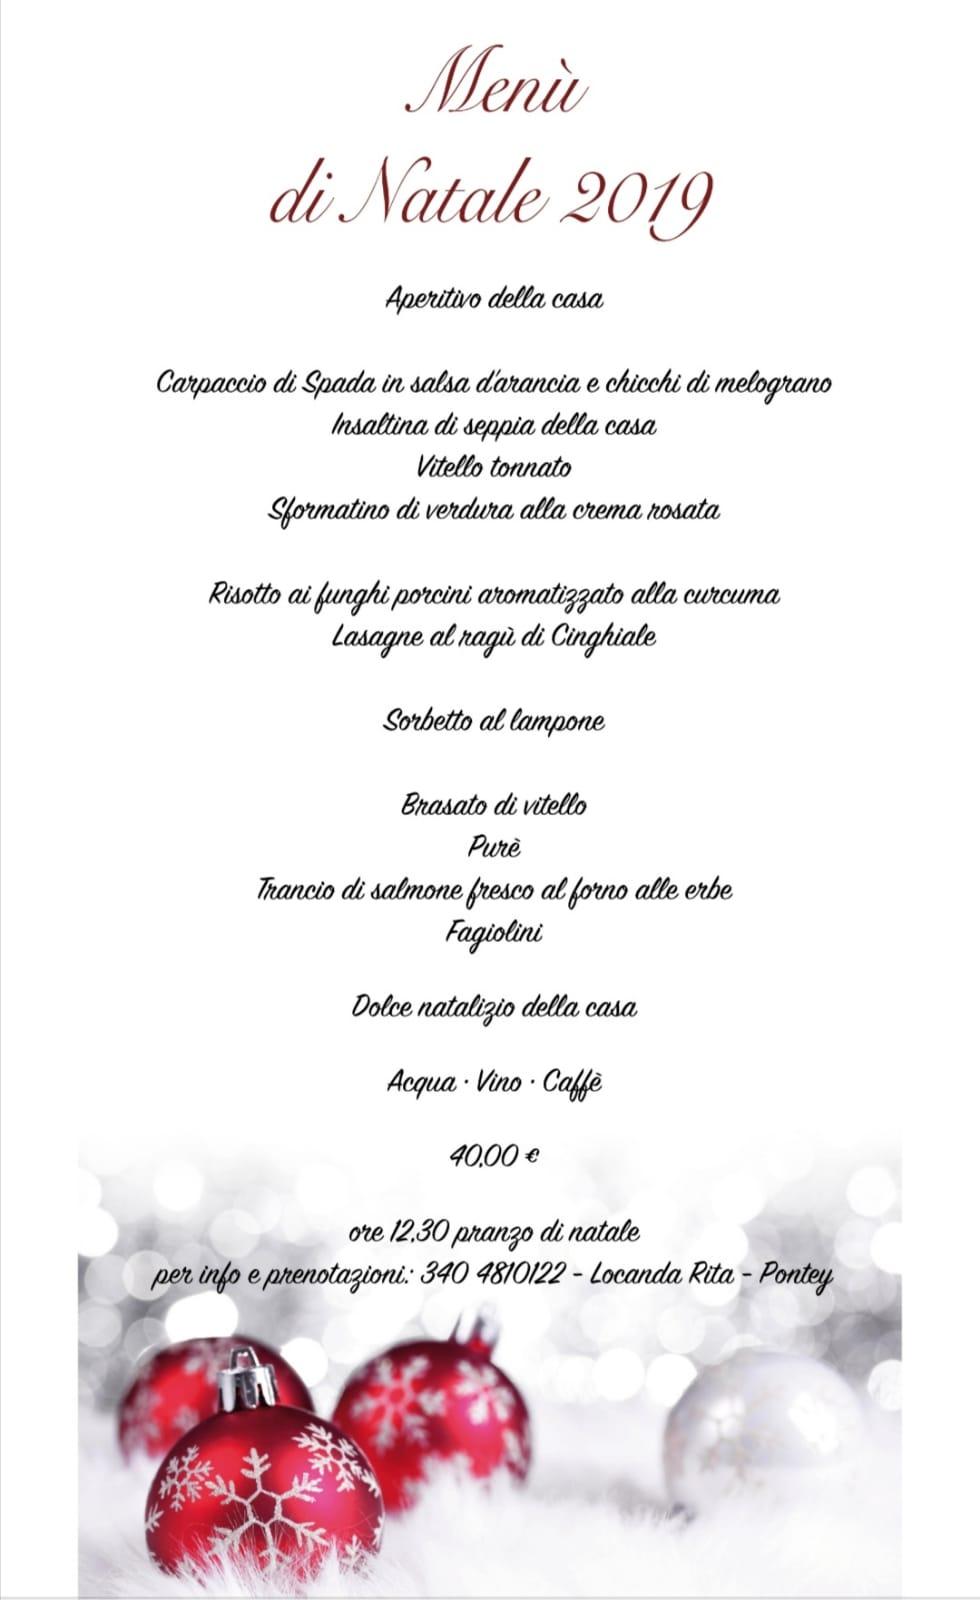 Locanda Rita, menu di Natale